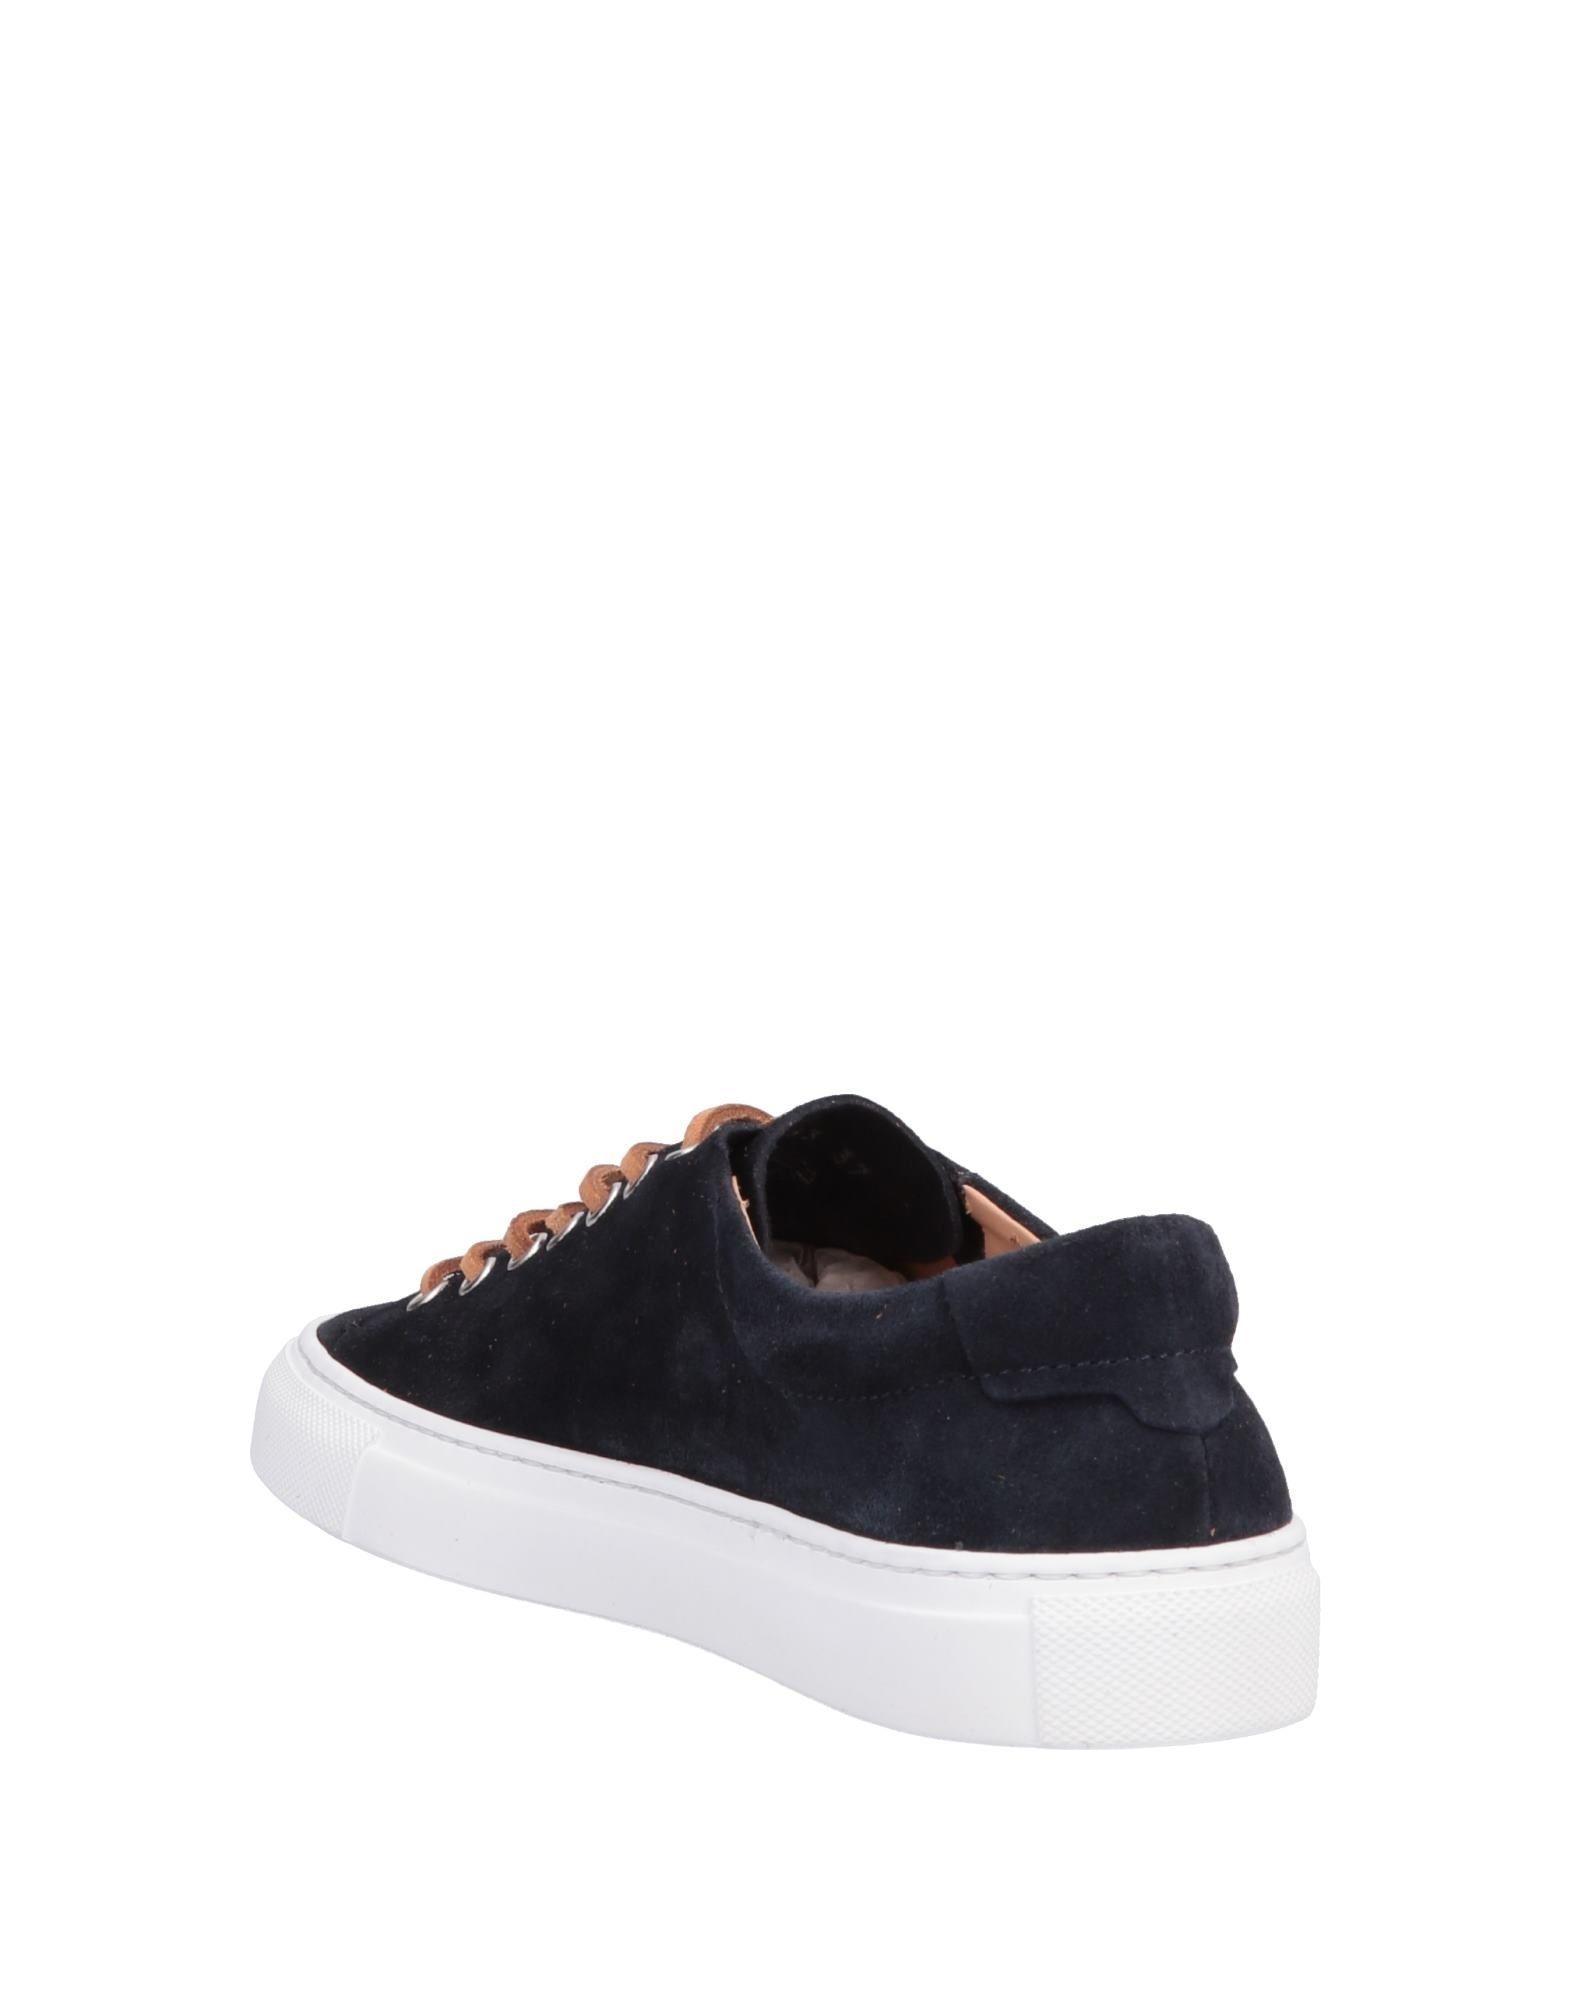 Sneakers & Tennis basses Boemos en coloris Bleu Bcti